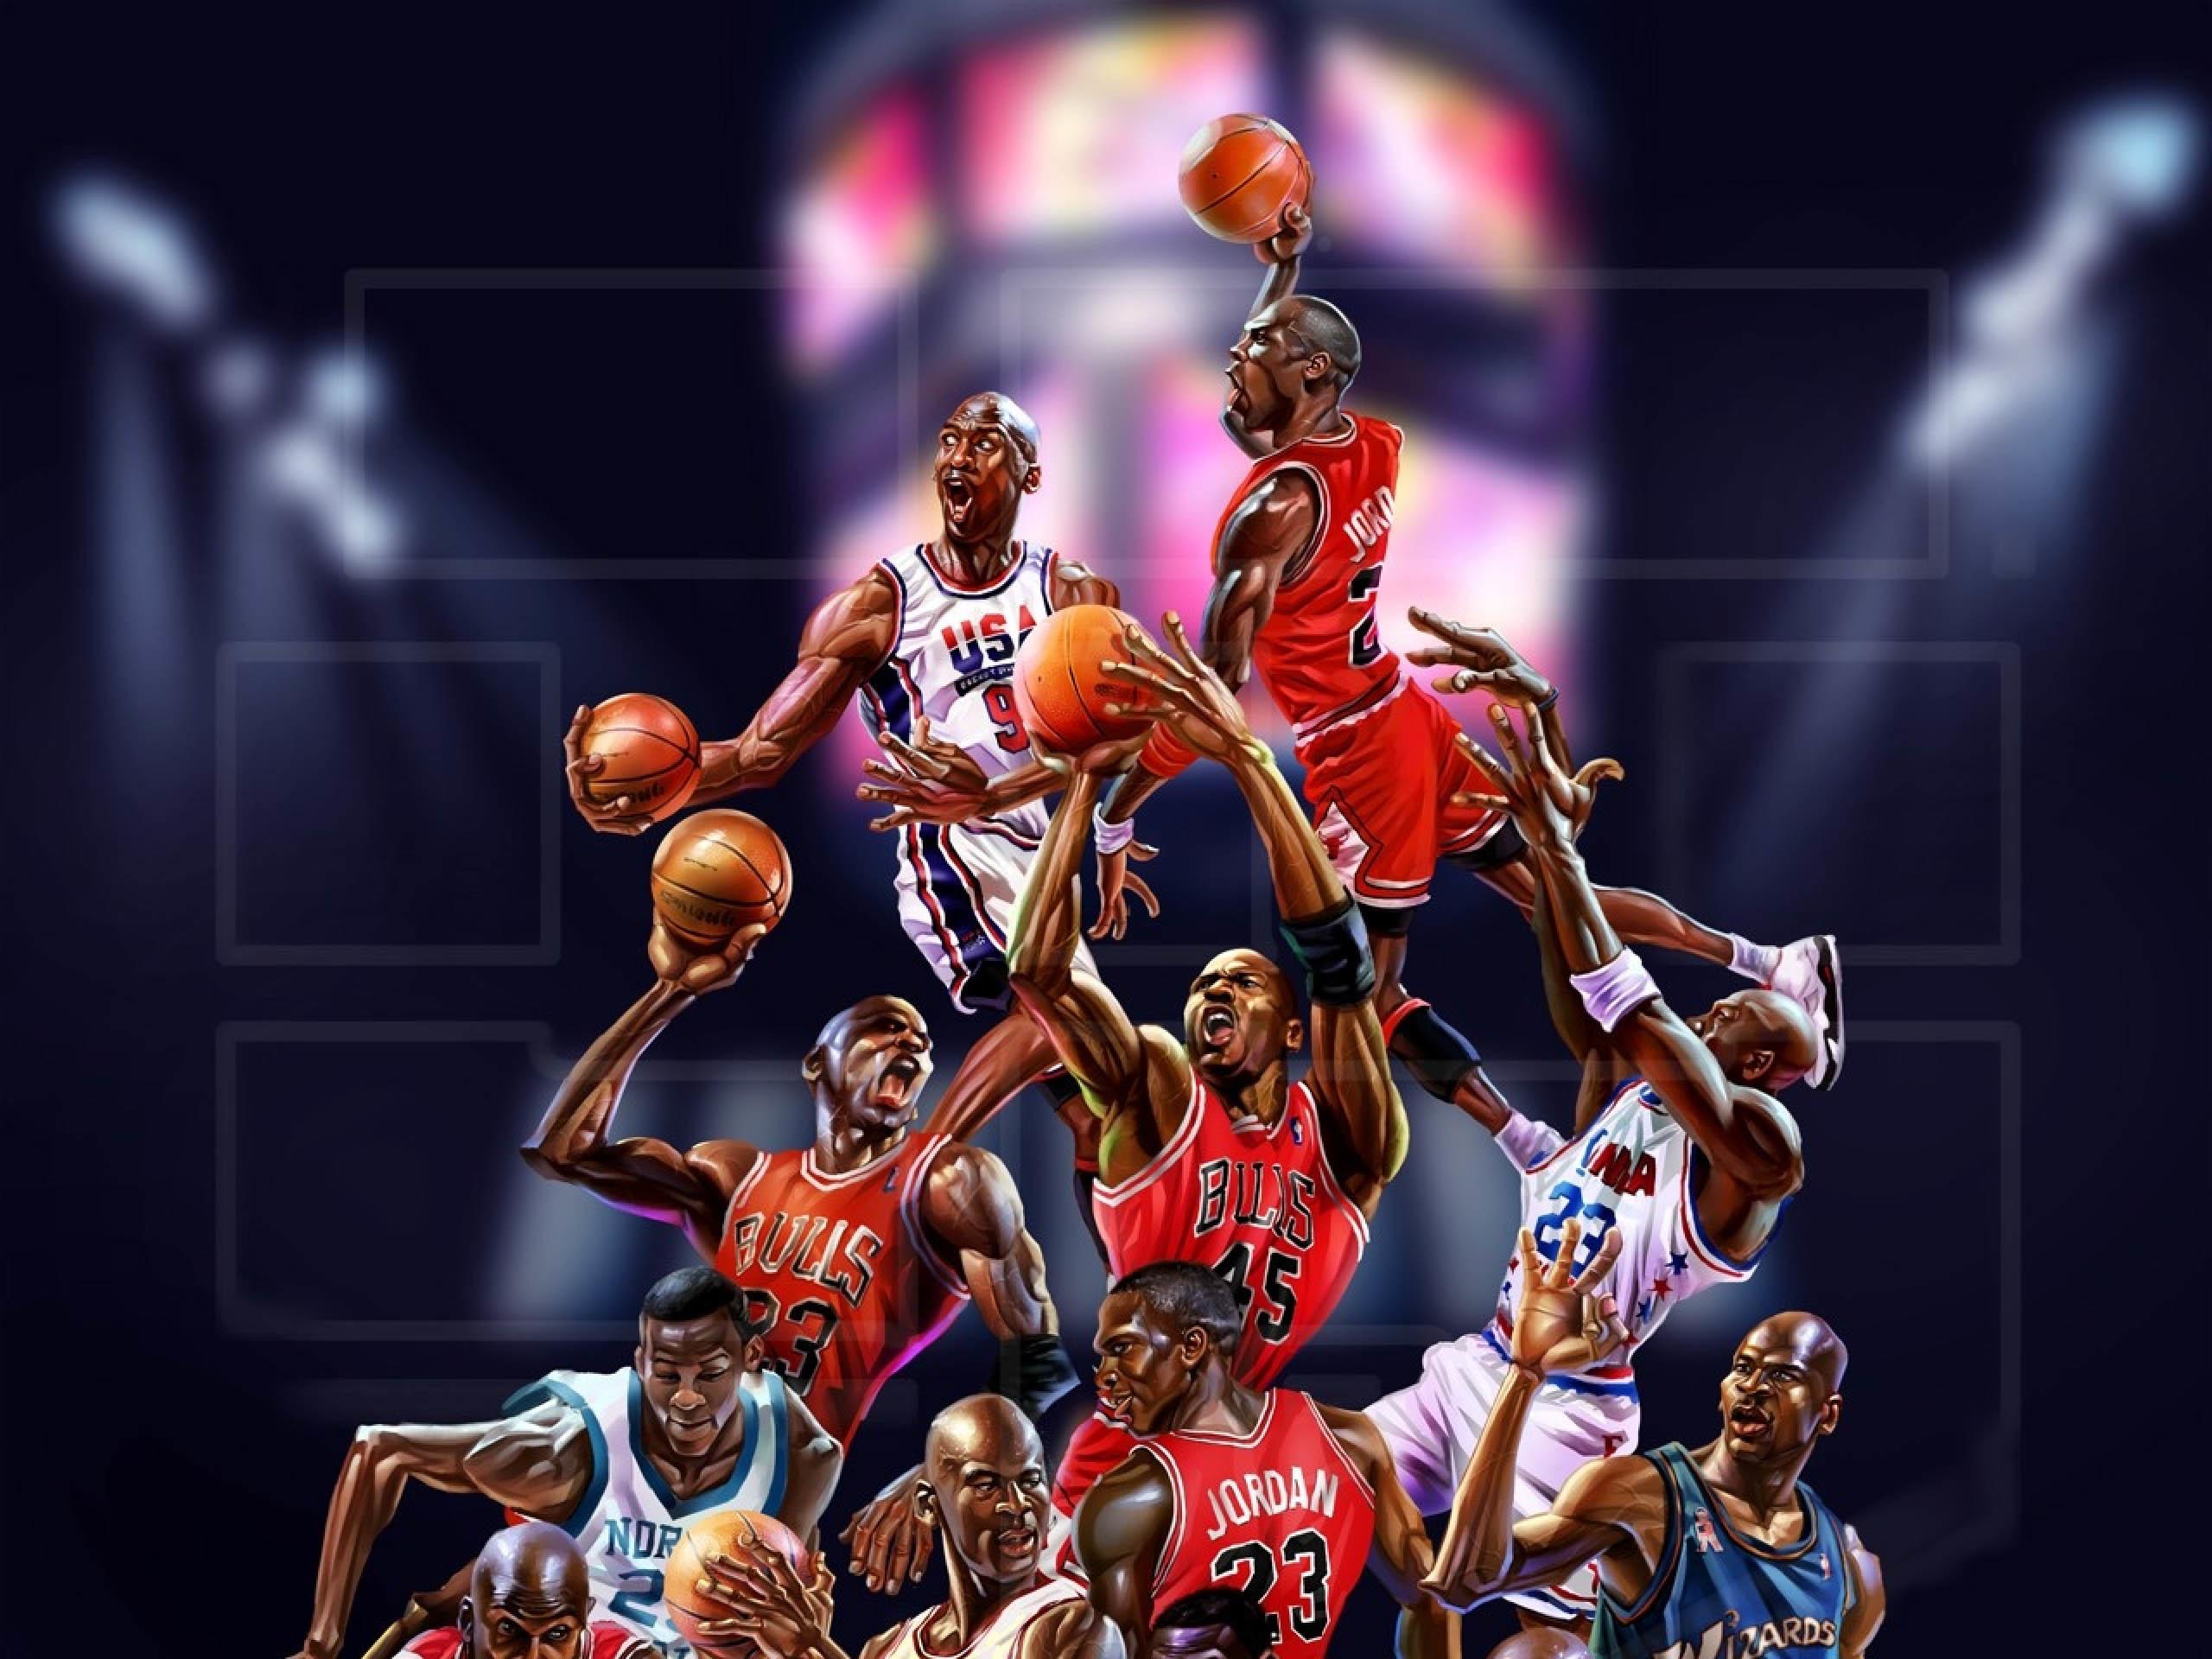 2560x1920 Michael Jordan Wallpapers Basketball Wallpapers At Download  C2 B7 A539c9a305690f829bd848974010e9ad Jpg